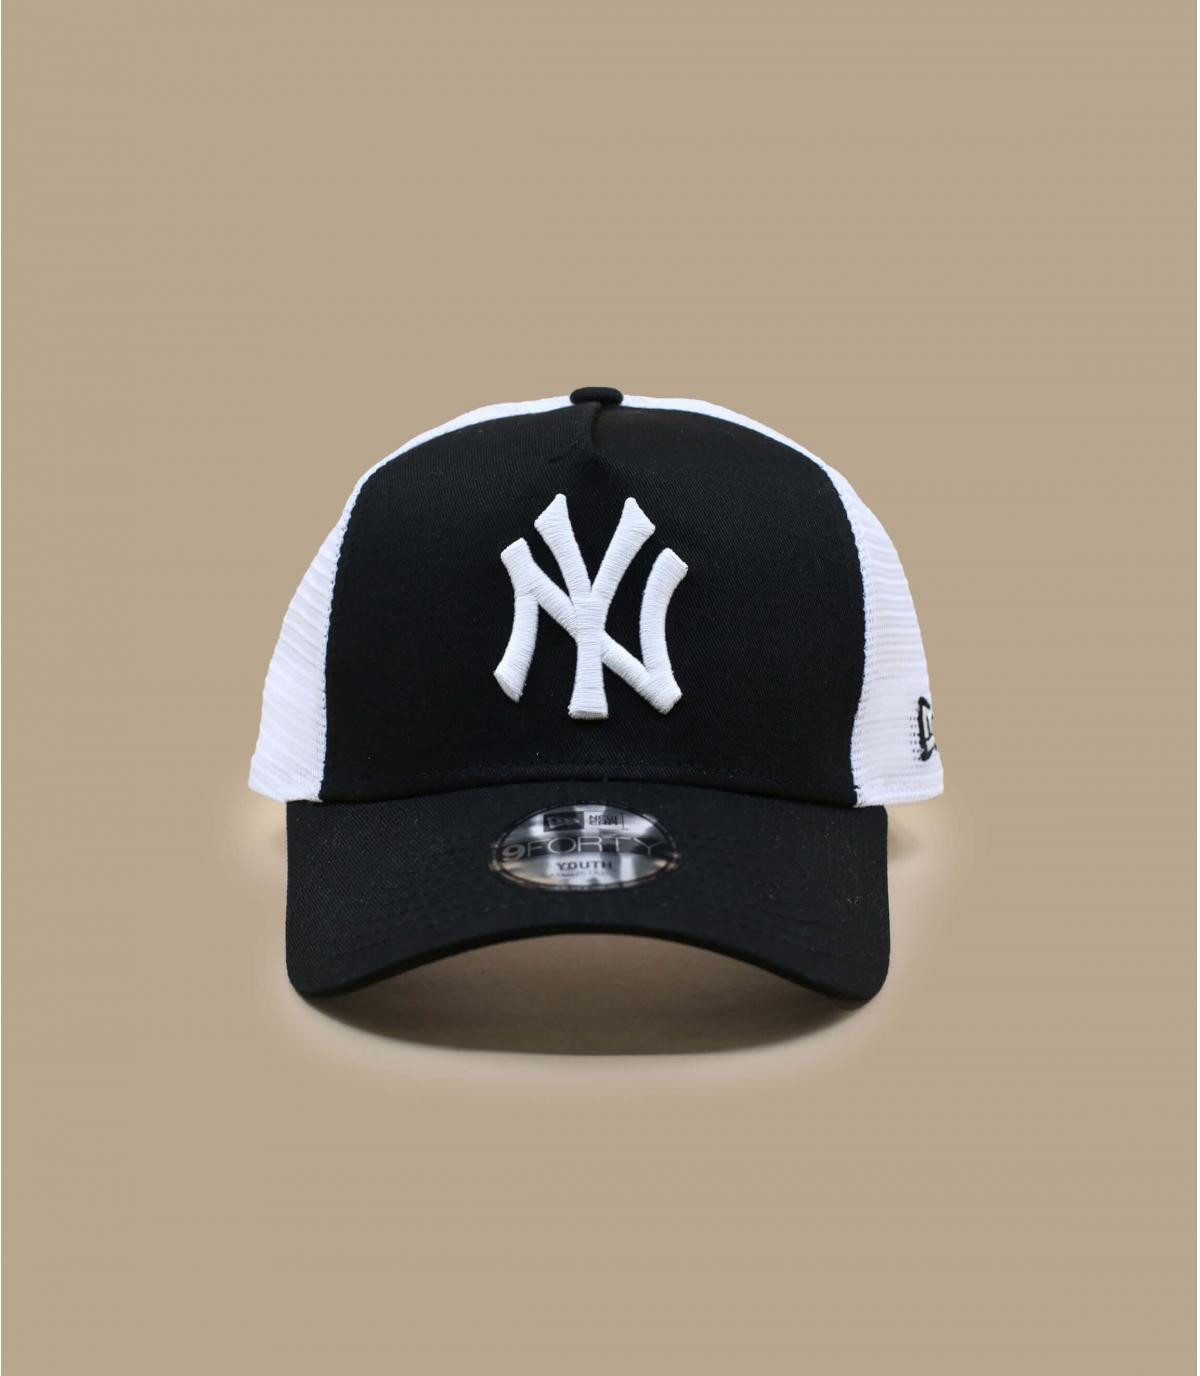 Details Trucker Cap Kids NY League Ess 940 black white - Abbildung 2